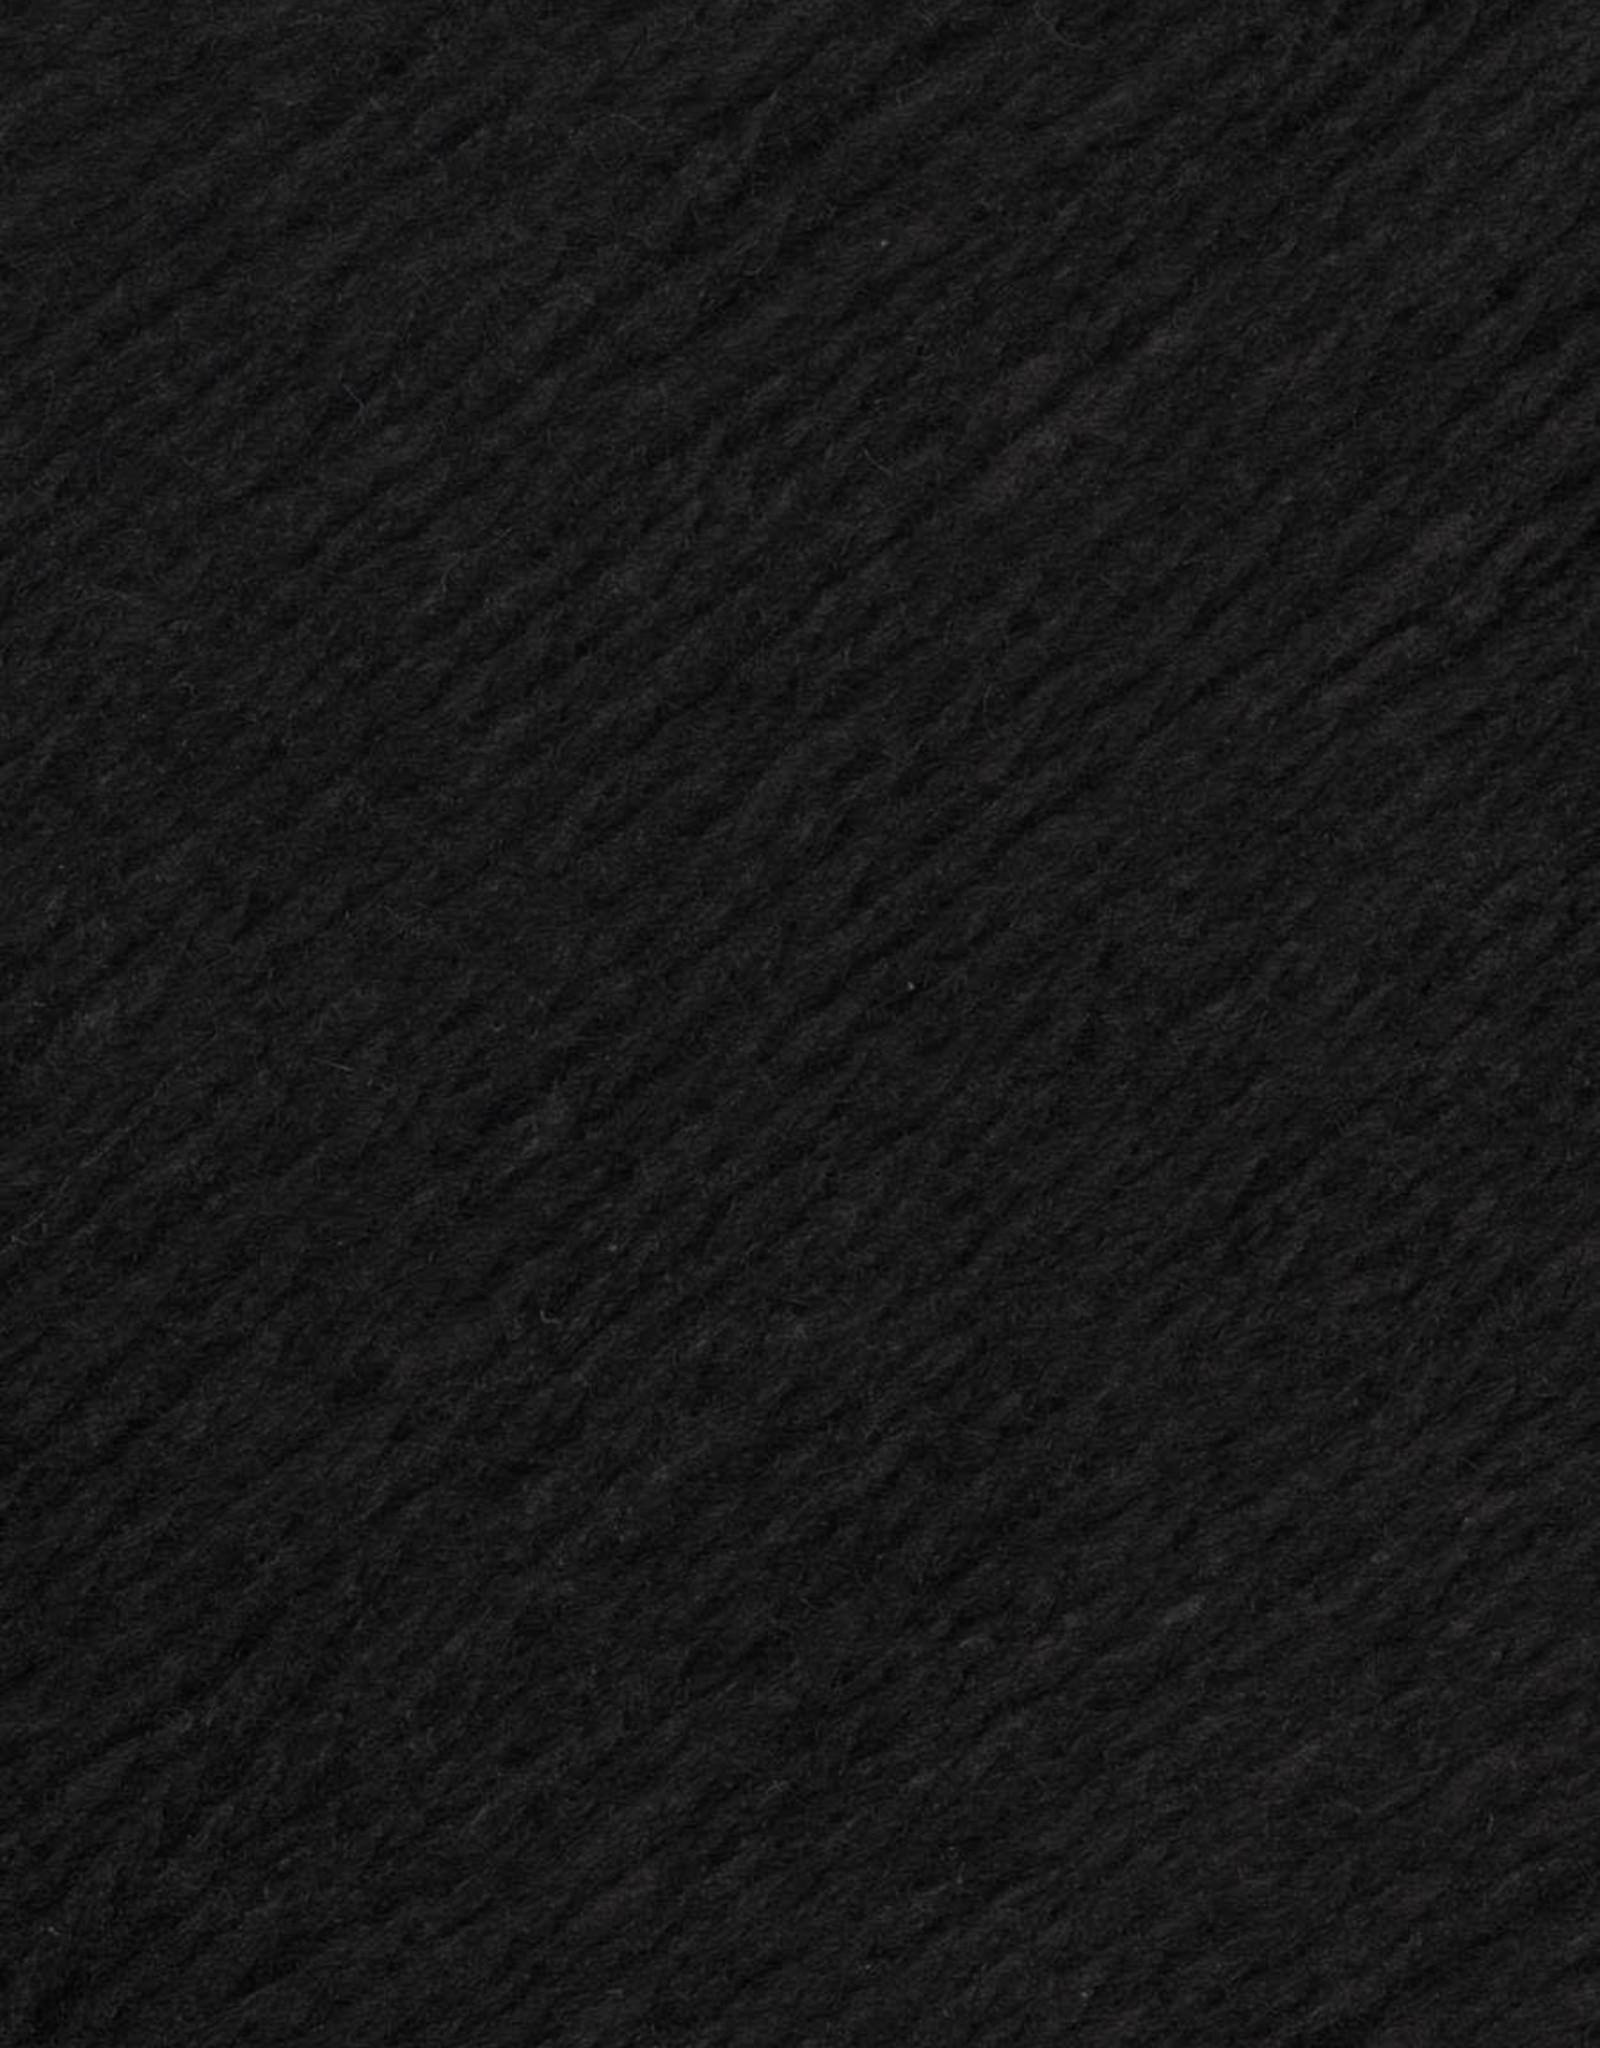 Queensland United 50g 24 Black